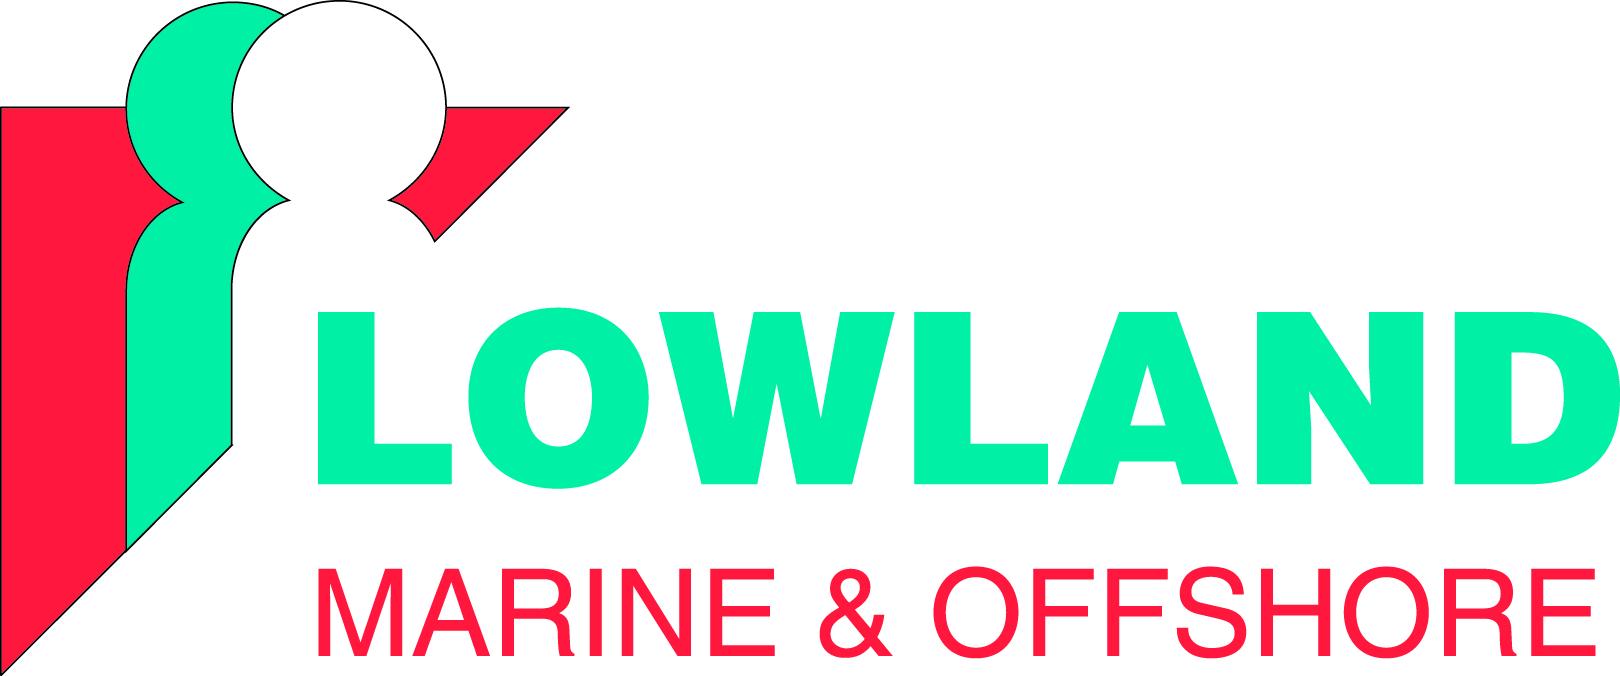 Lowland Marine & Offshore